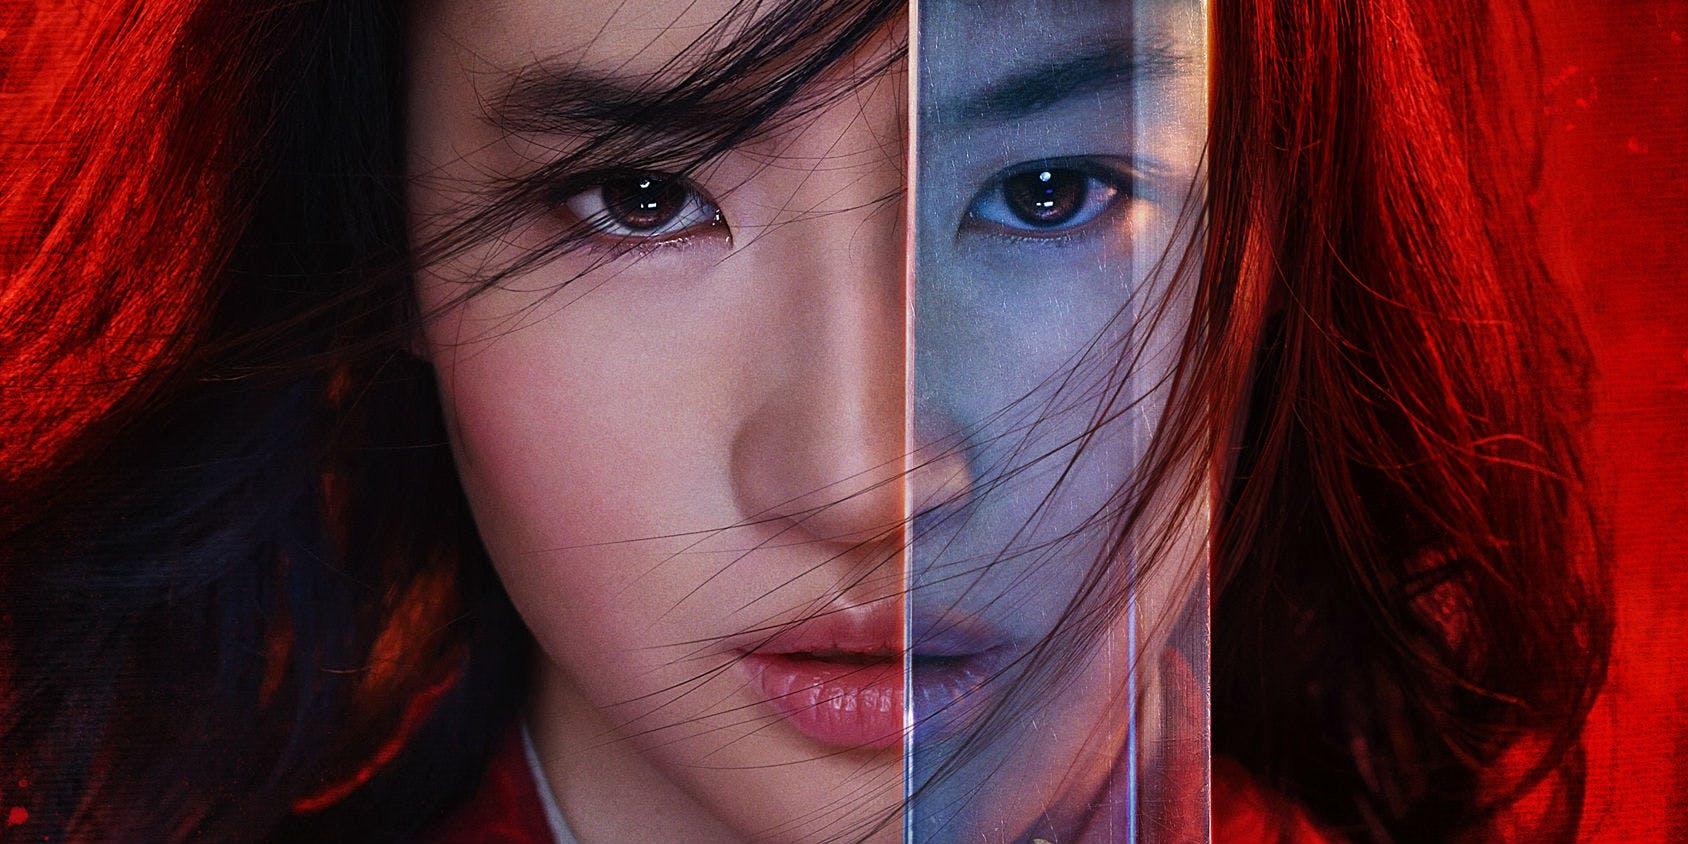 El remake live-action de Mulan libera emocionante teaser tráiler